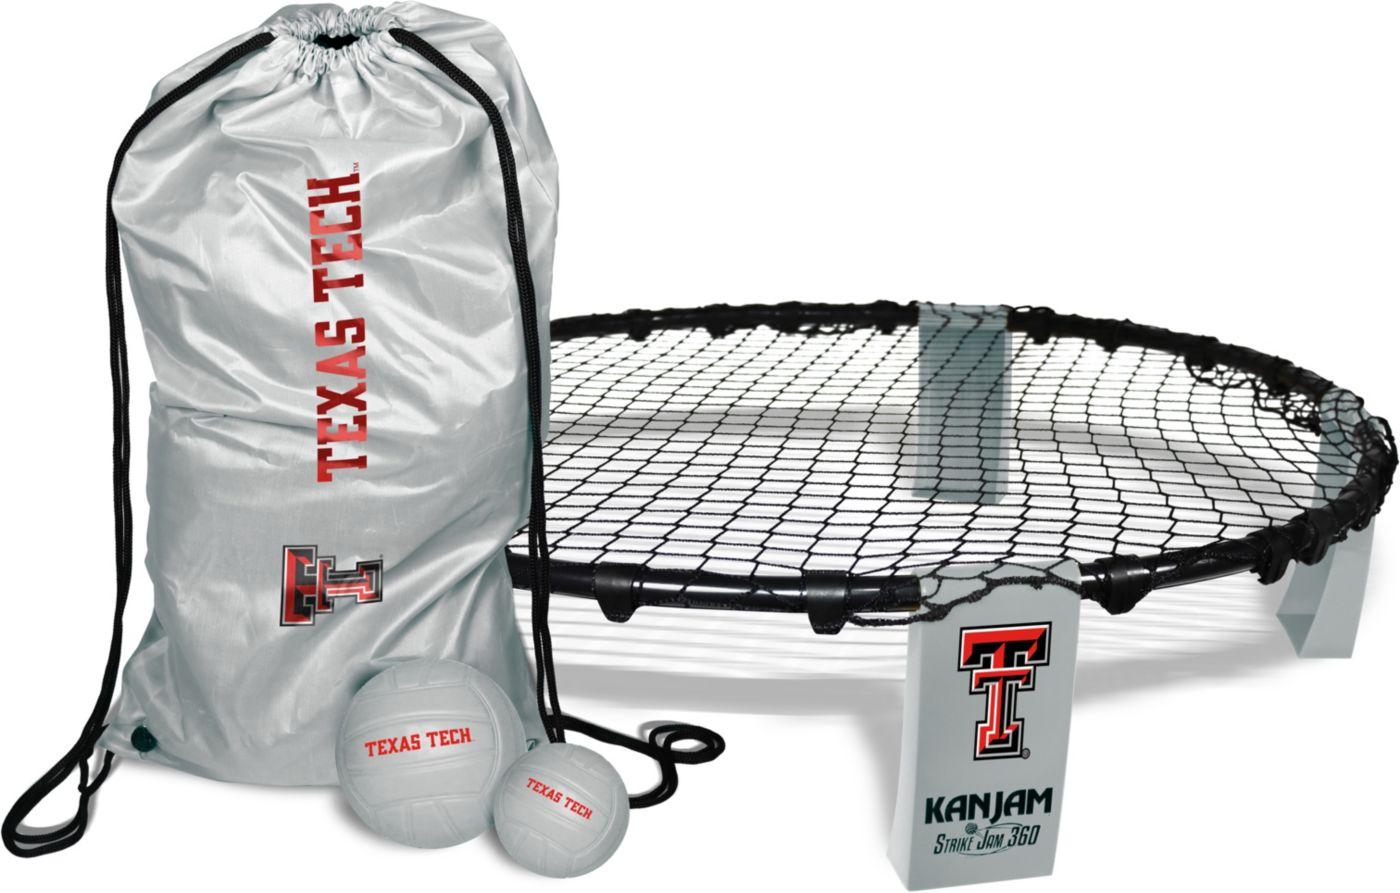 Wild Sports Texas Tech Red Raiders Strike Jam Combo Game